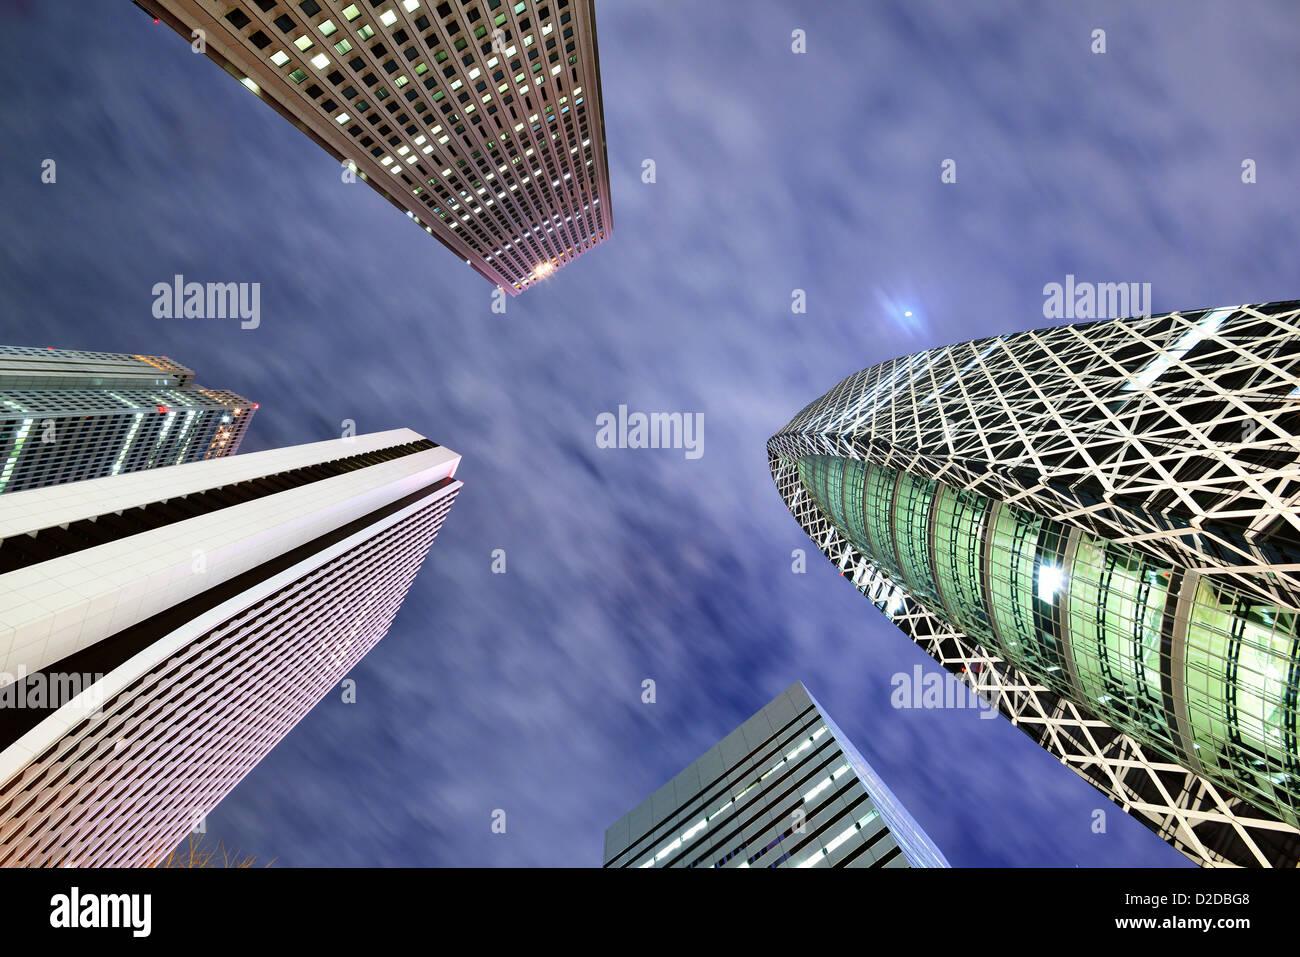 Hochhäuser im Bezirk Shinjuku, Tokio, Japan. Stockbild